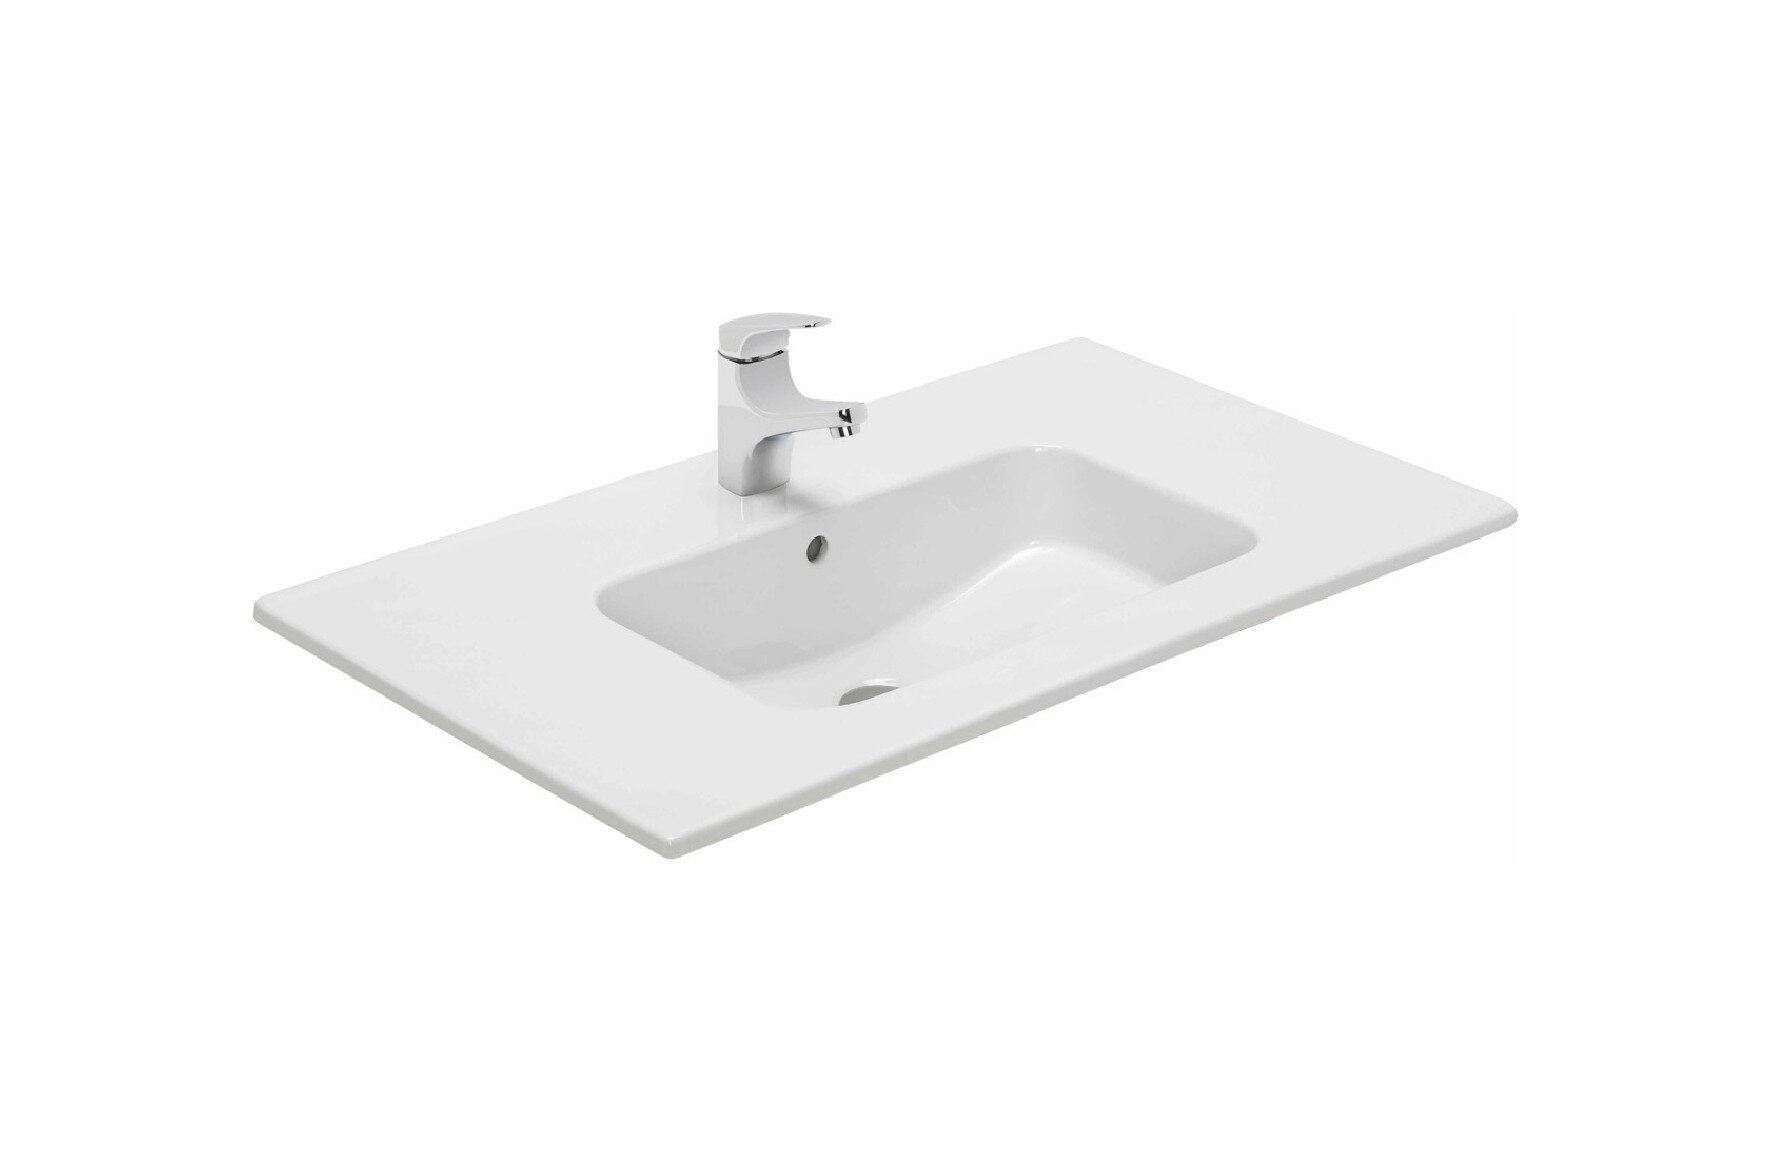 Latitude Run Bathroom Sinks You Ll Love In 2021 Wayfair